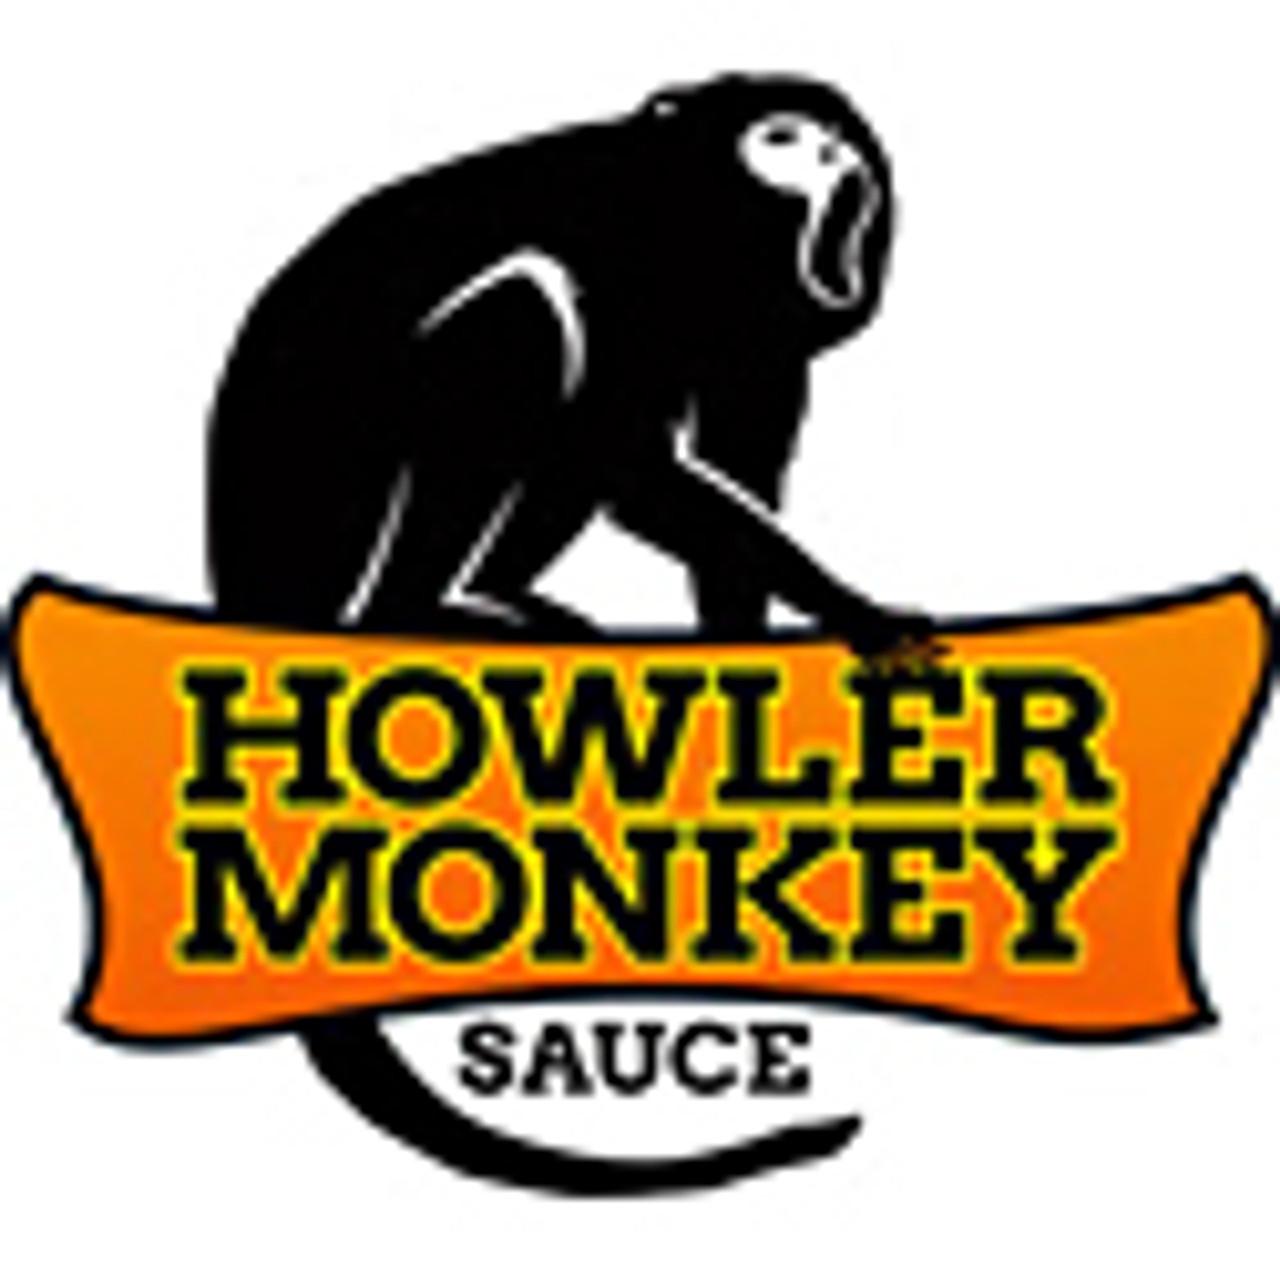 Howler Monkey Hot Sauce